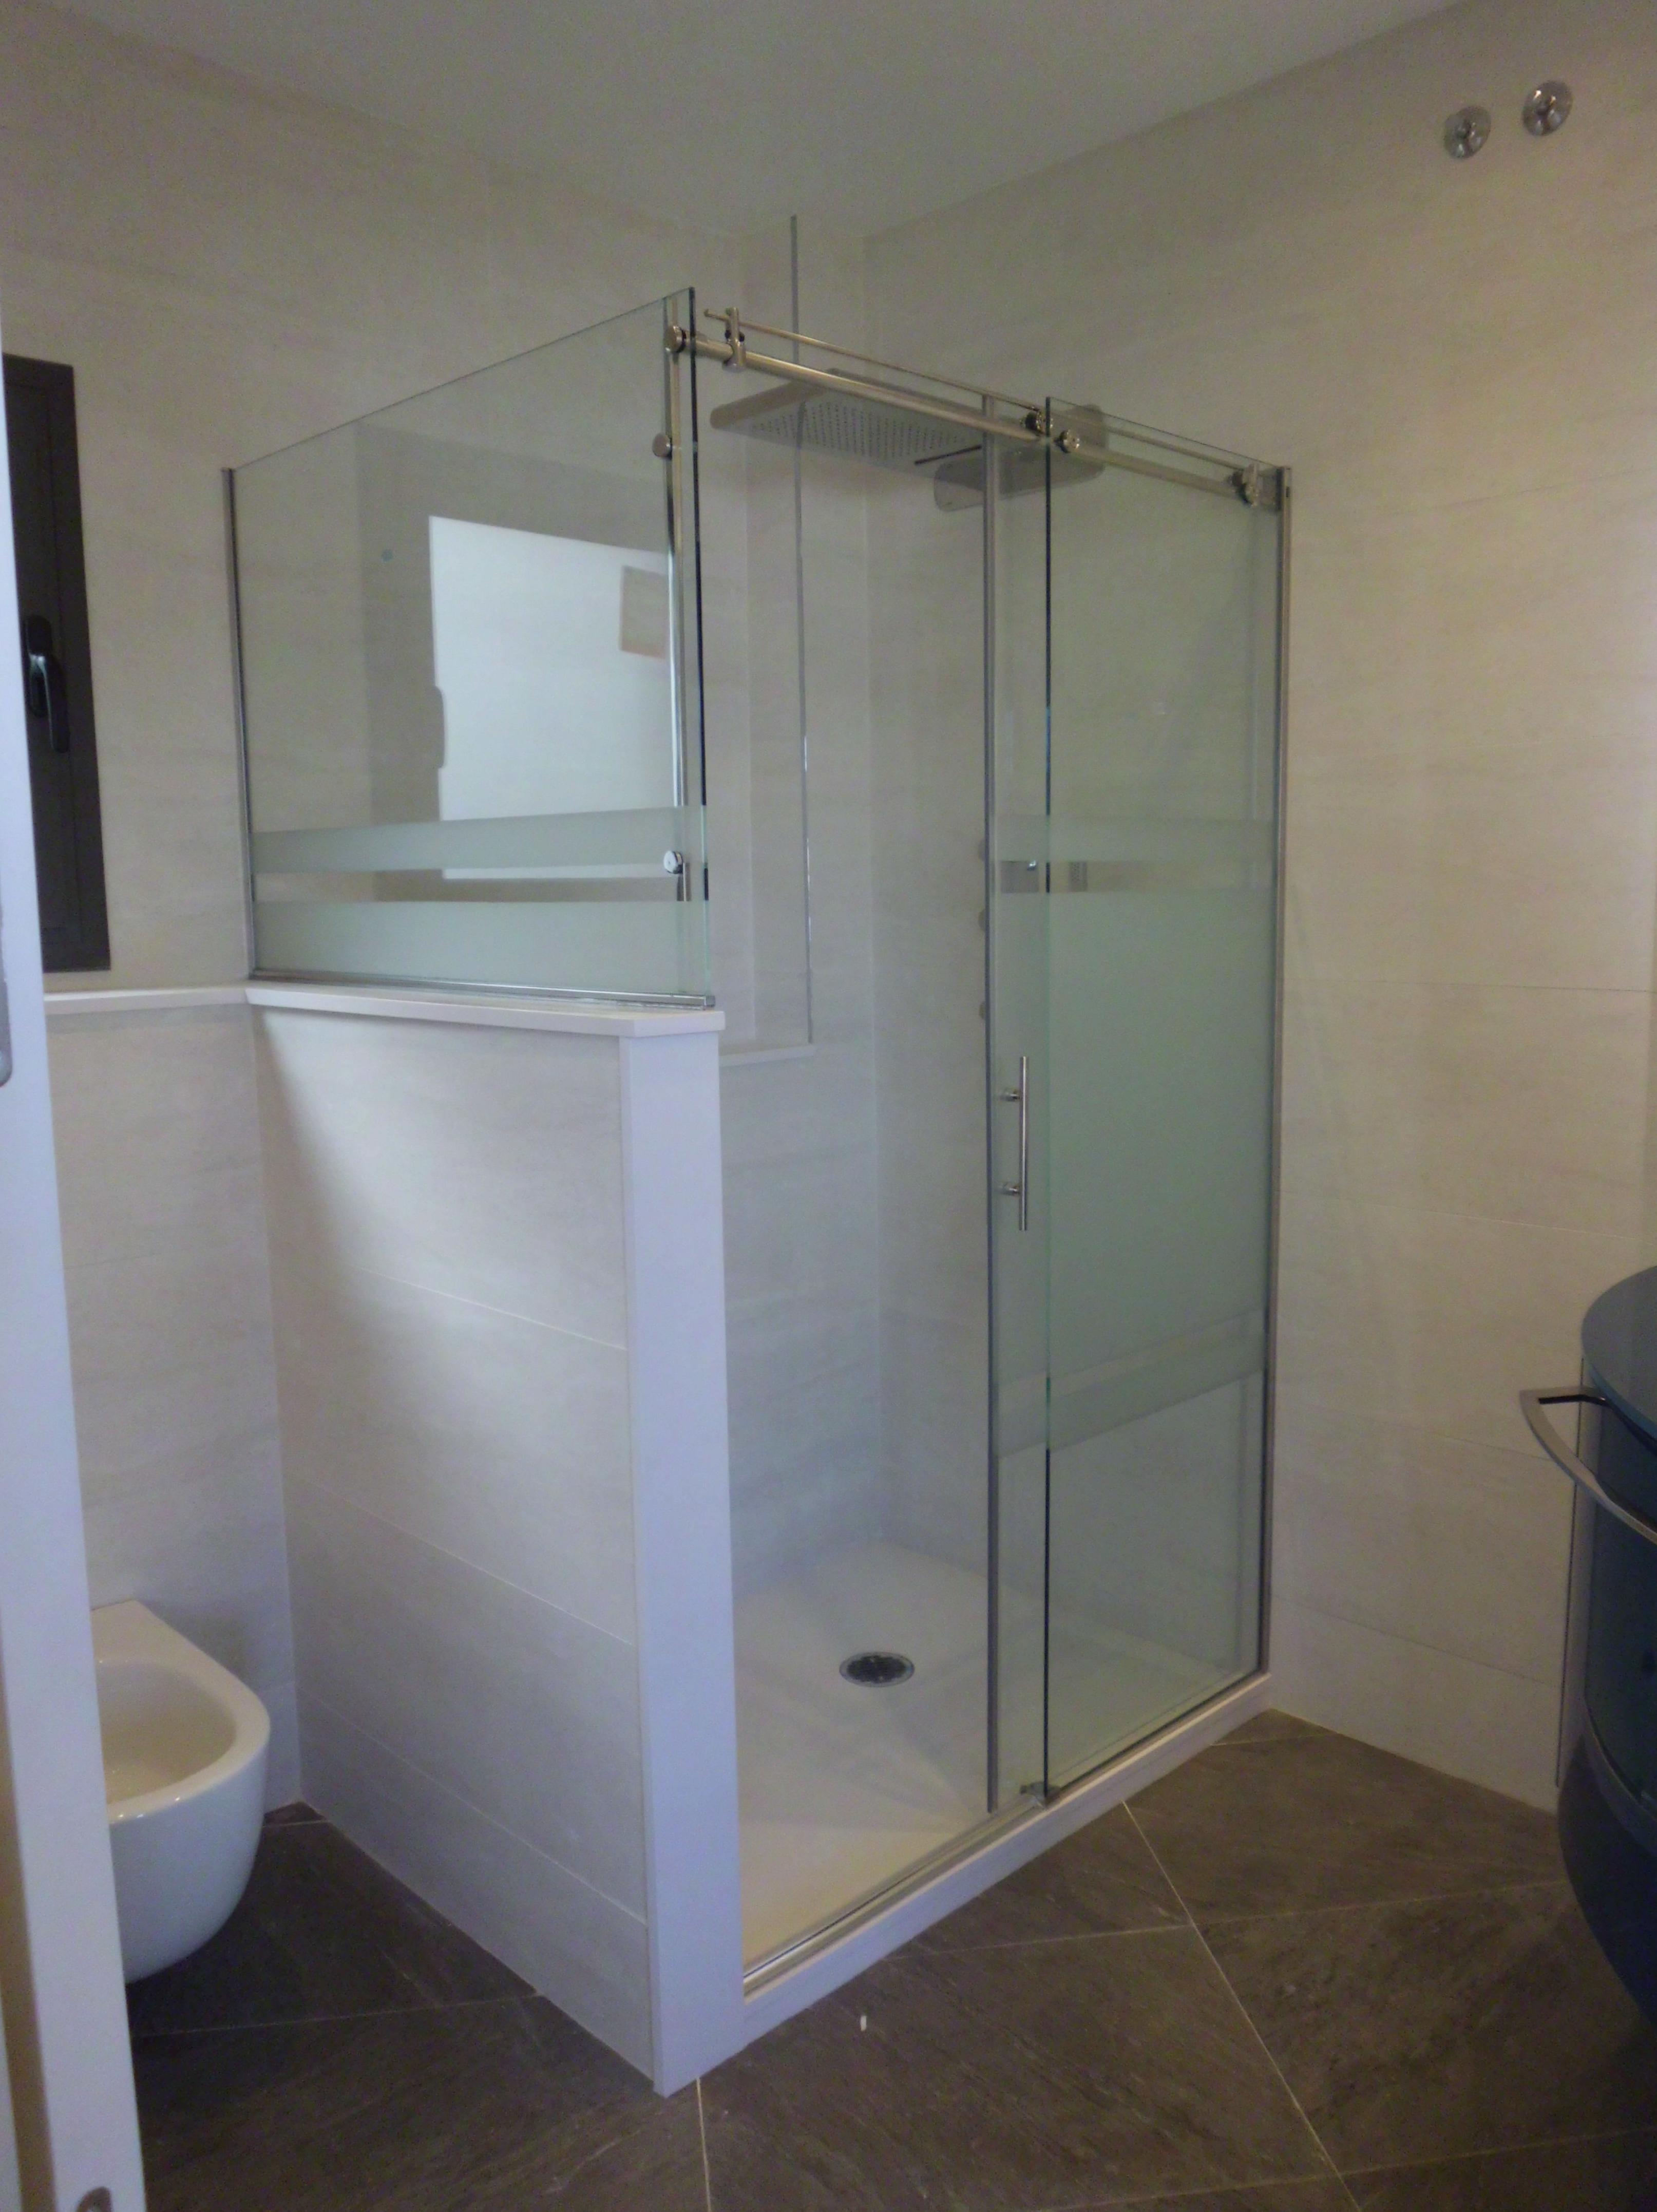 Reforma integral de de alta calidad de un piso \u002D Mampara